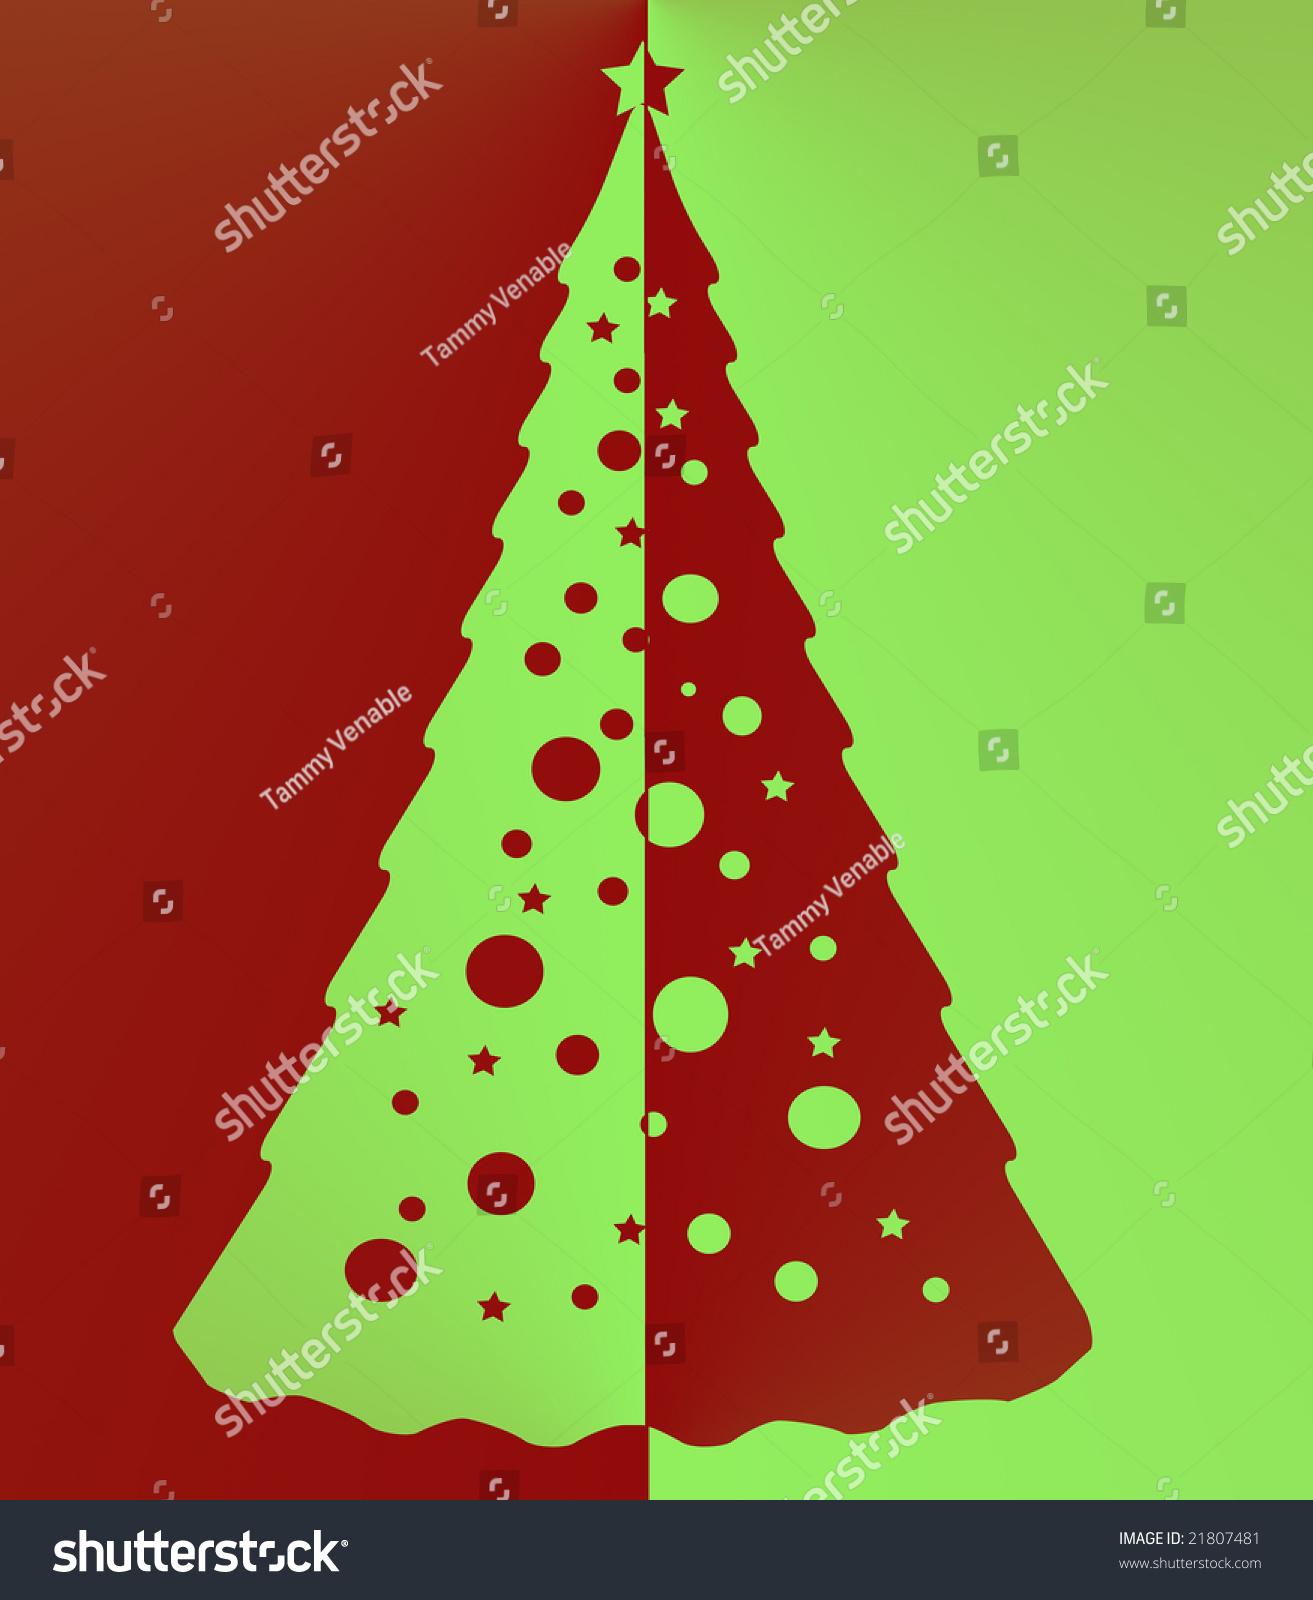 Two tone christmas tree stock photo shutterstock